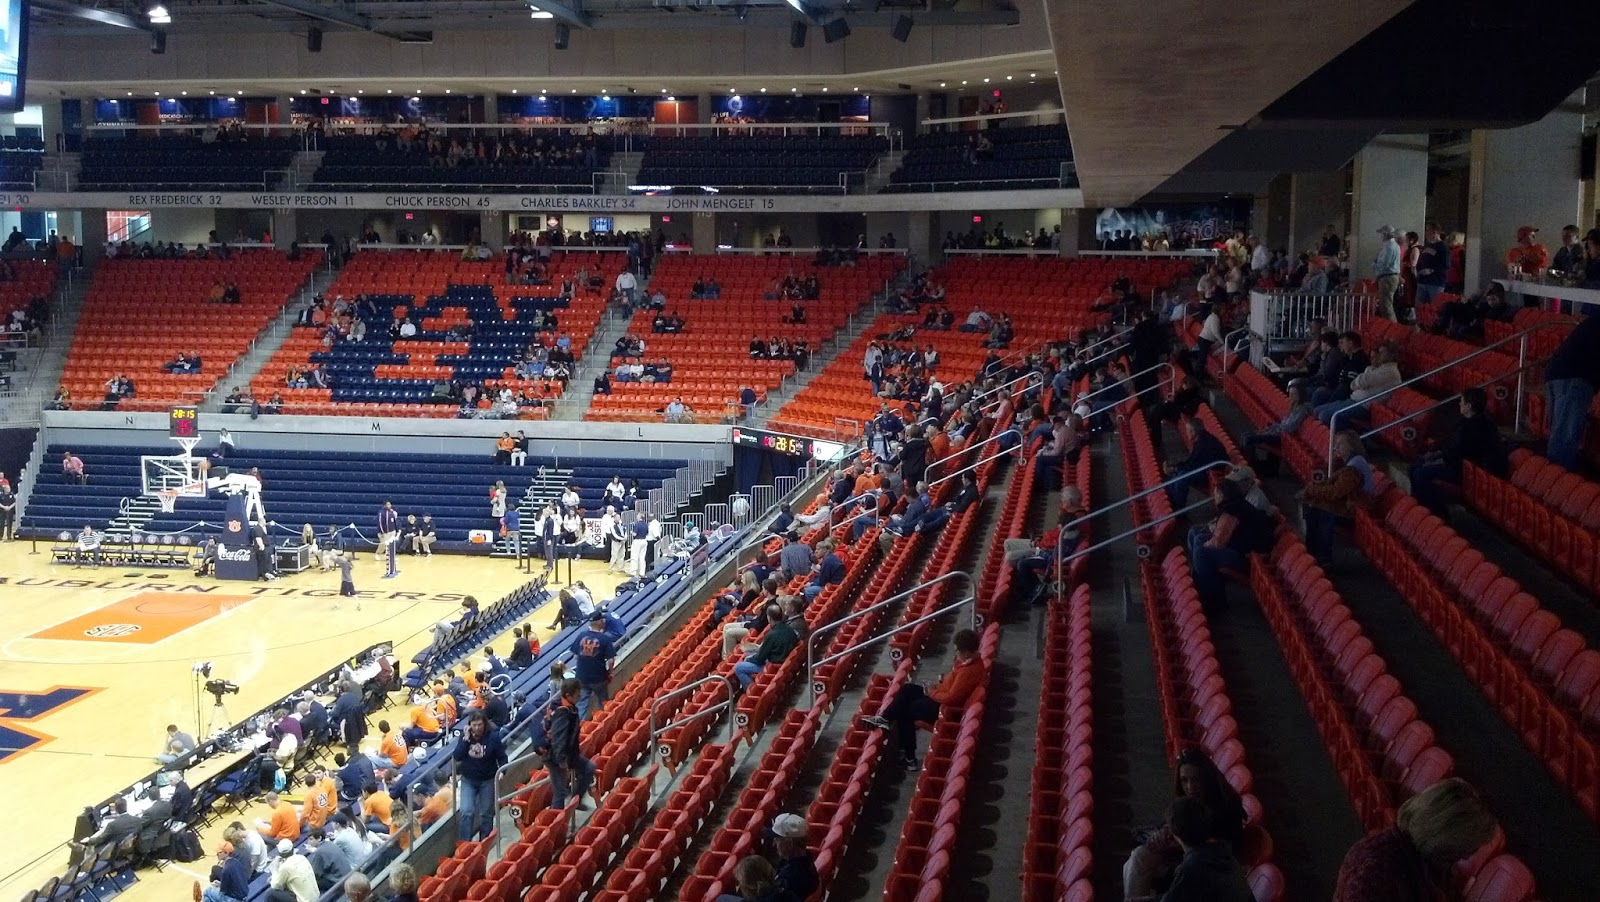 Scolin S Sports Venues Visited 150 Auburn University